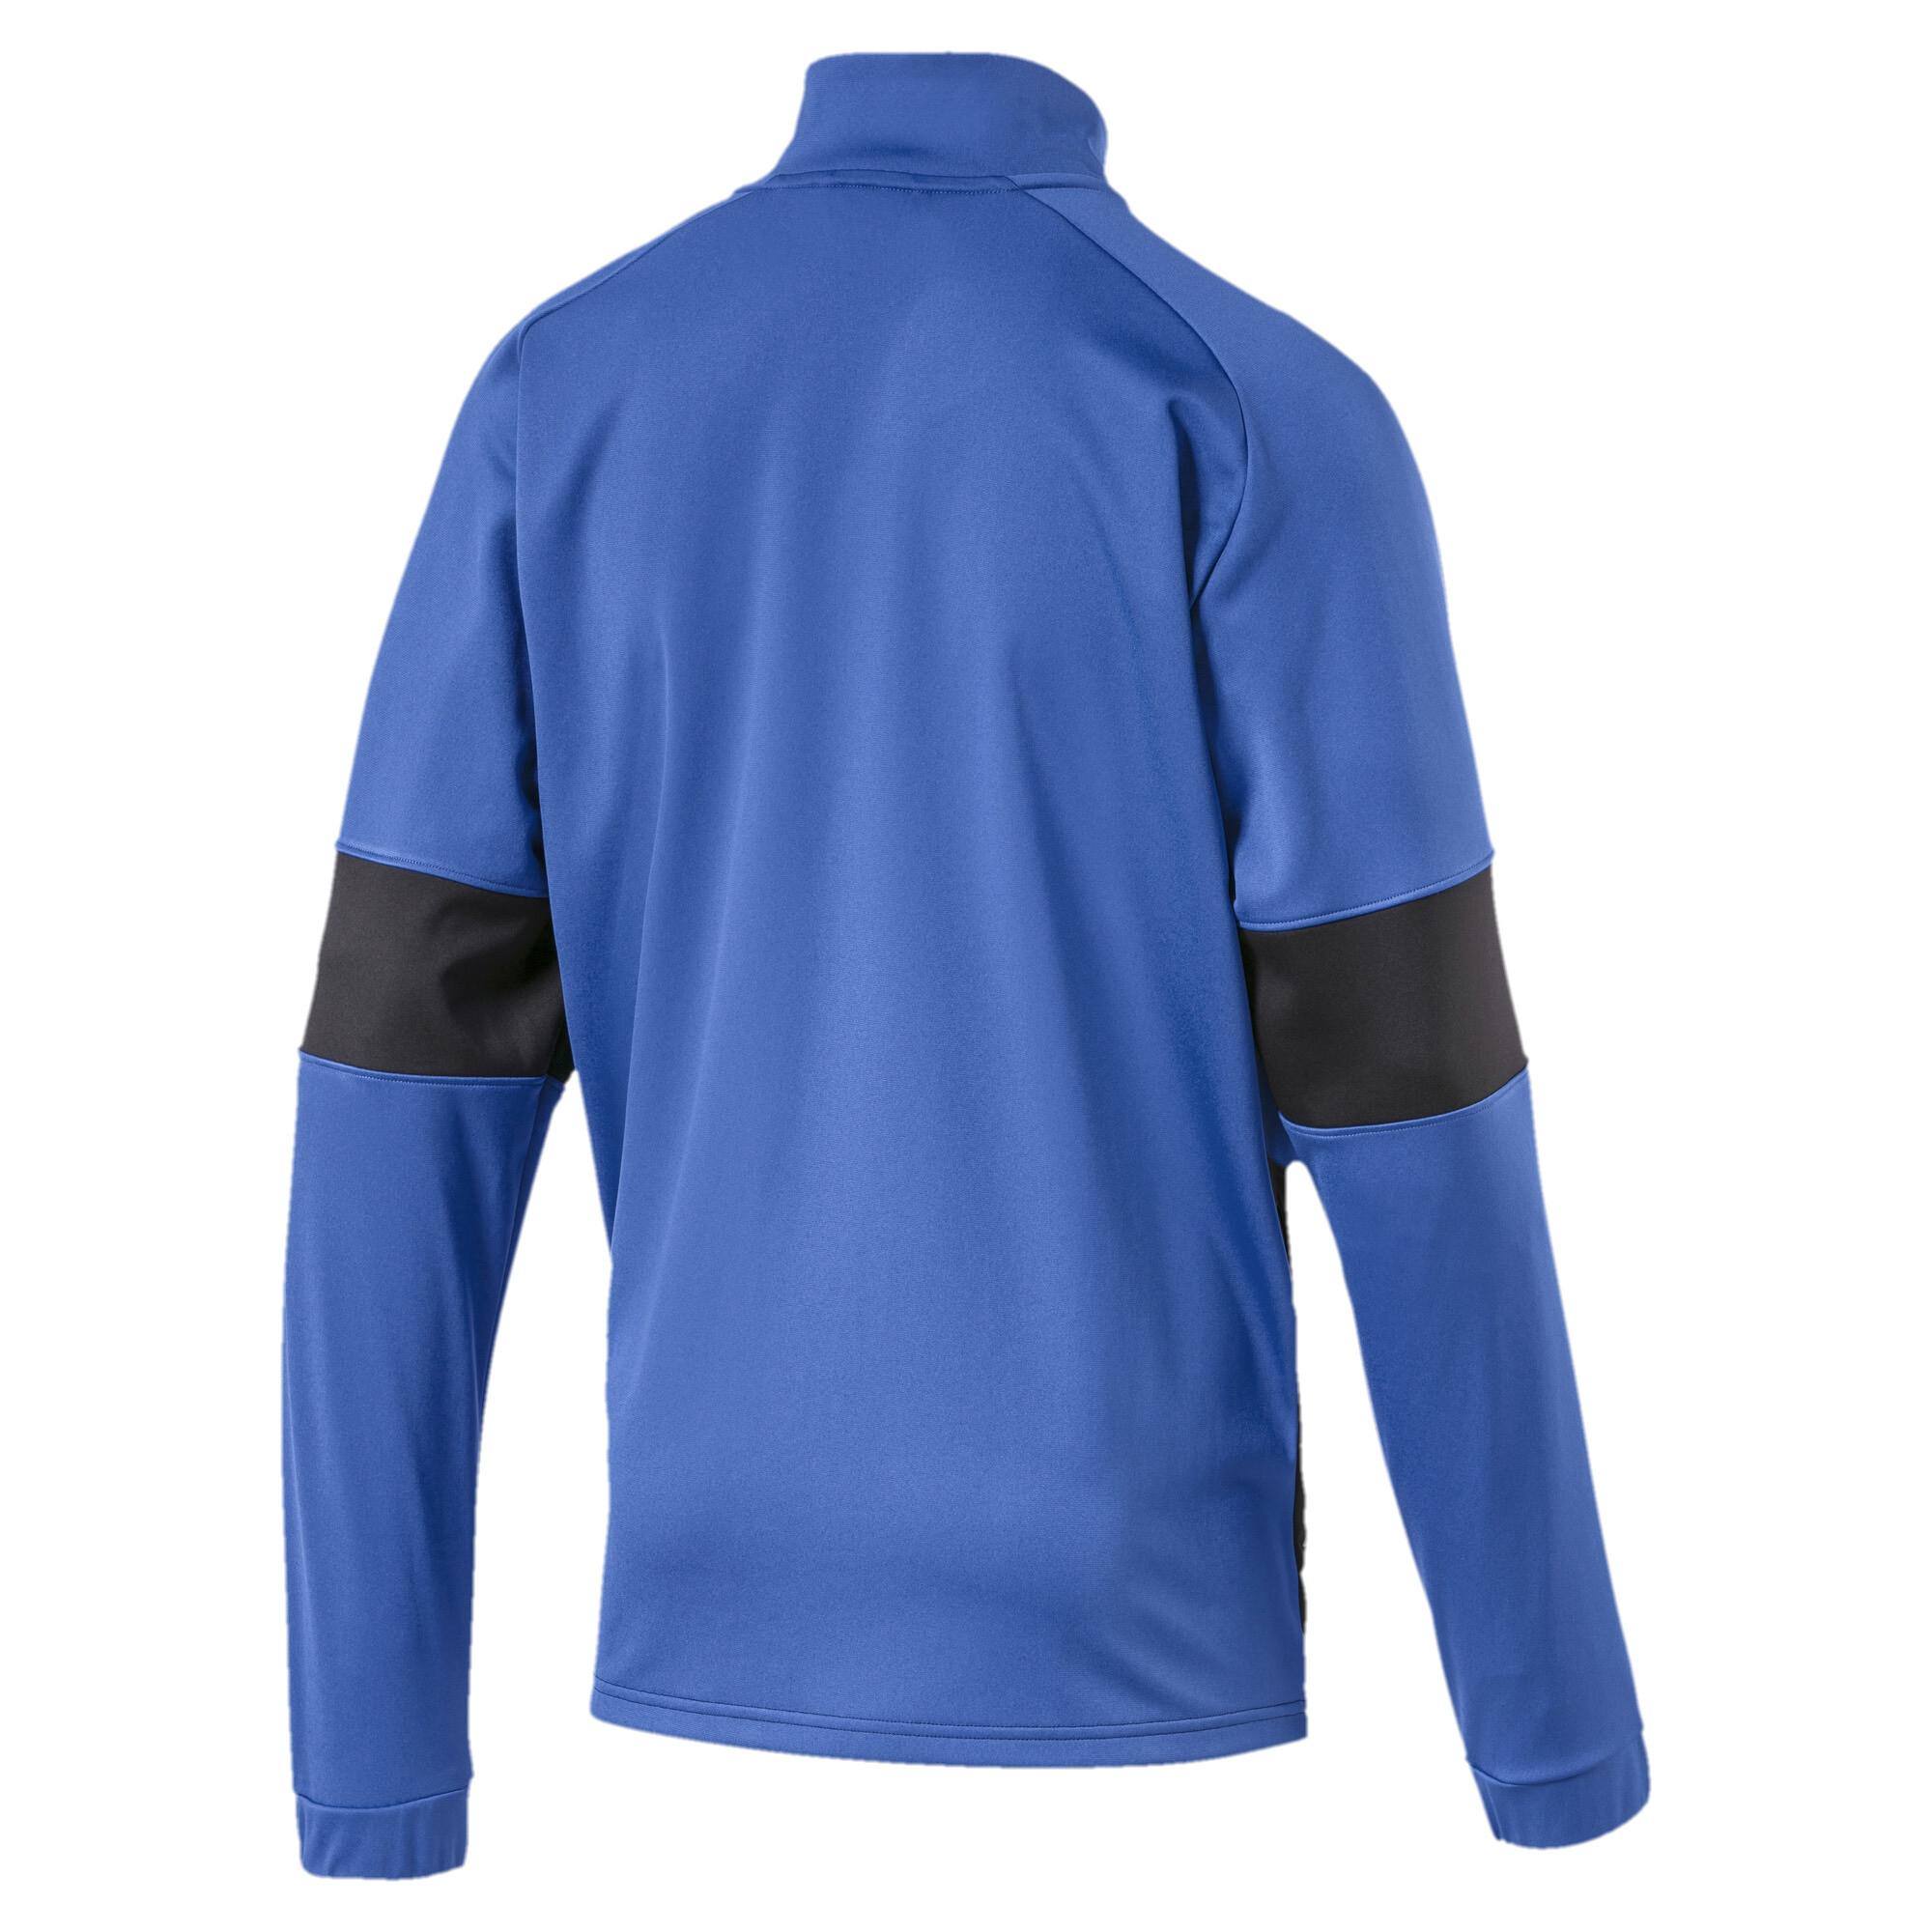 PUMA-PUMA-Blaster-Men-039-s-Jacket-Men-Knitted-Jacket-Training thumbnail 19